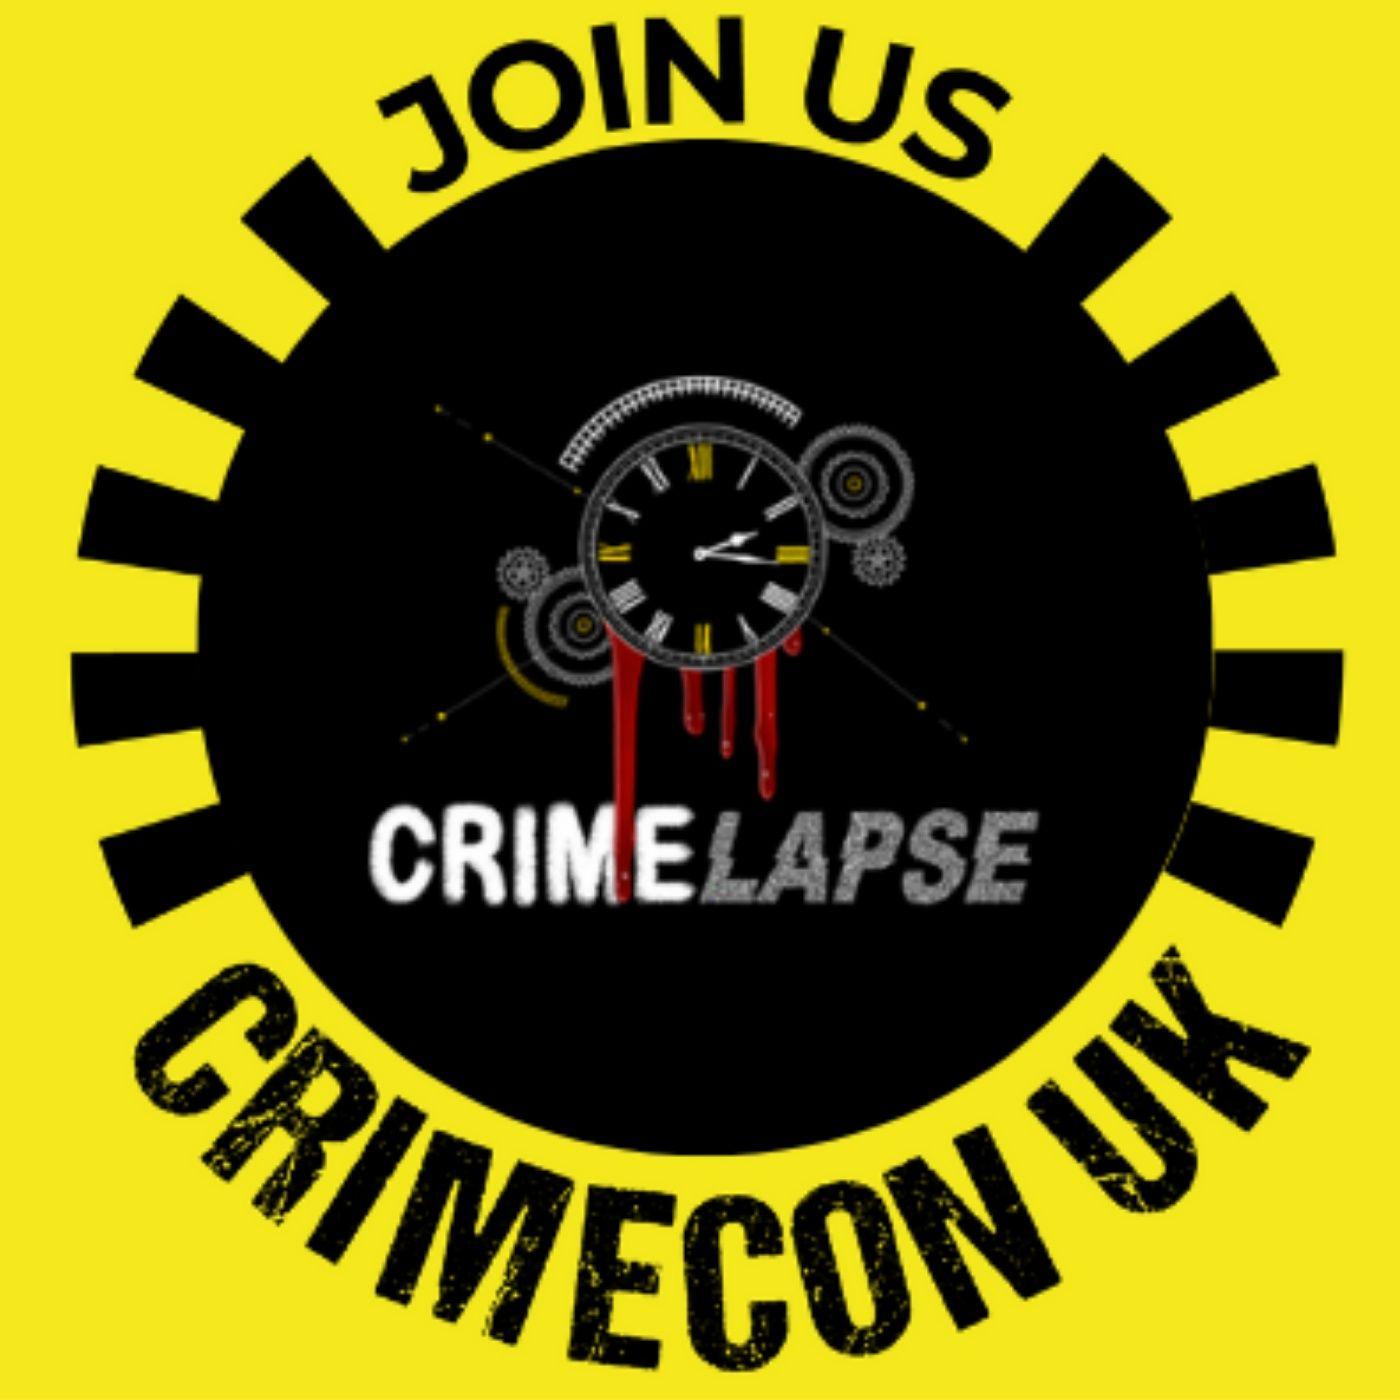 Crime ConVersations: CrimeLapse X Morbidology